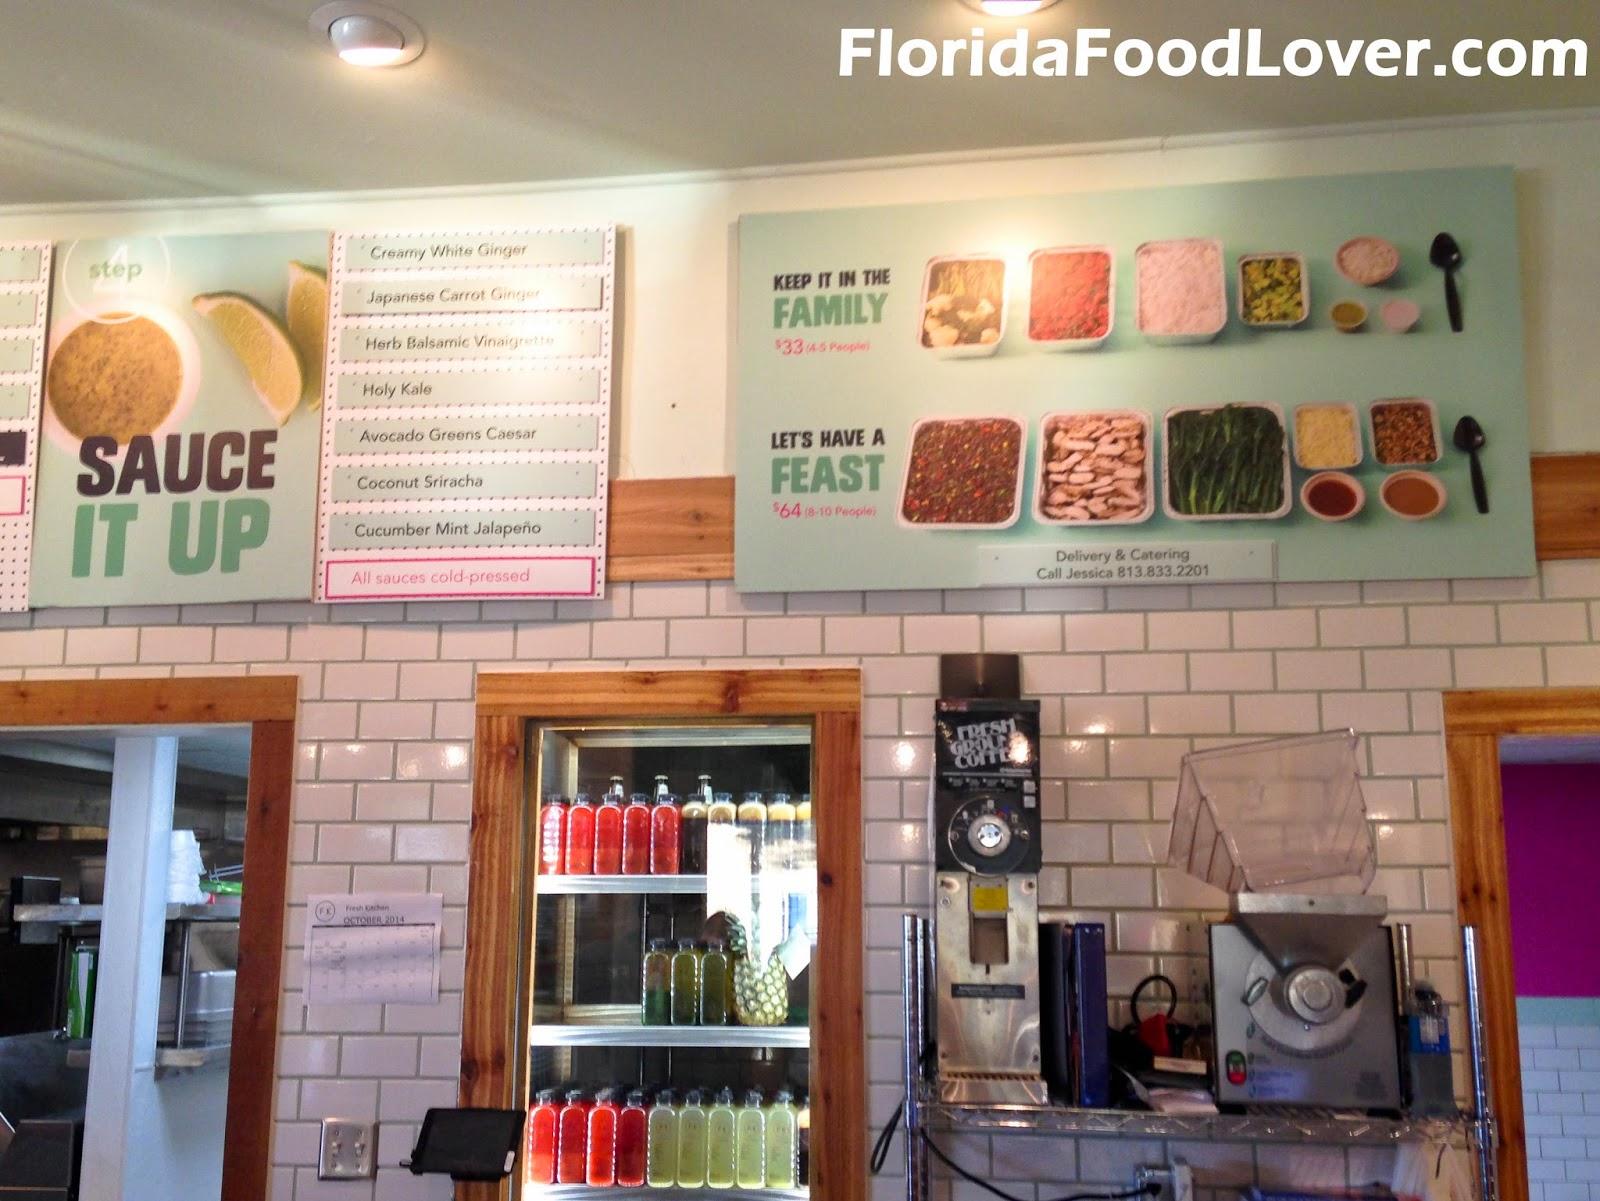 Florida Food Lover Fresh Kitchen – Tampa FL